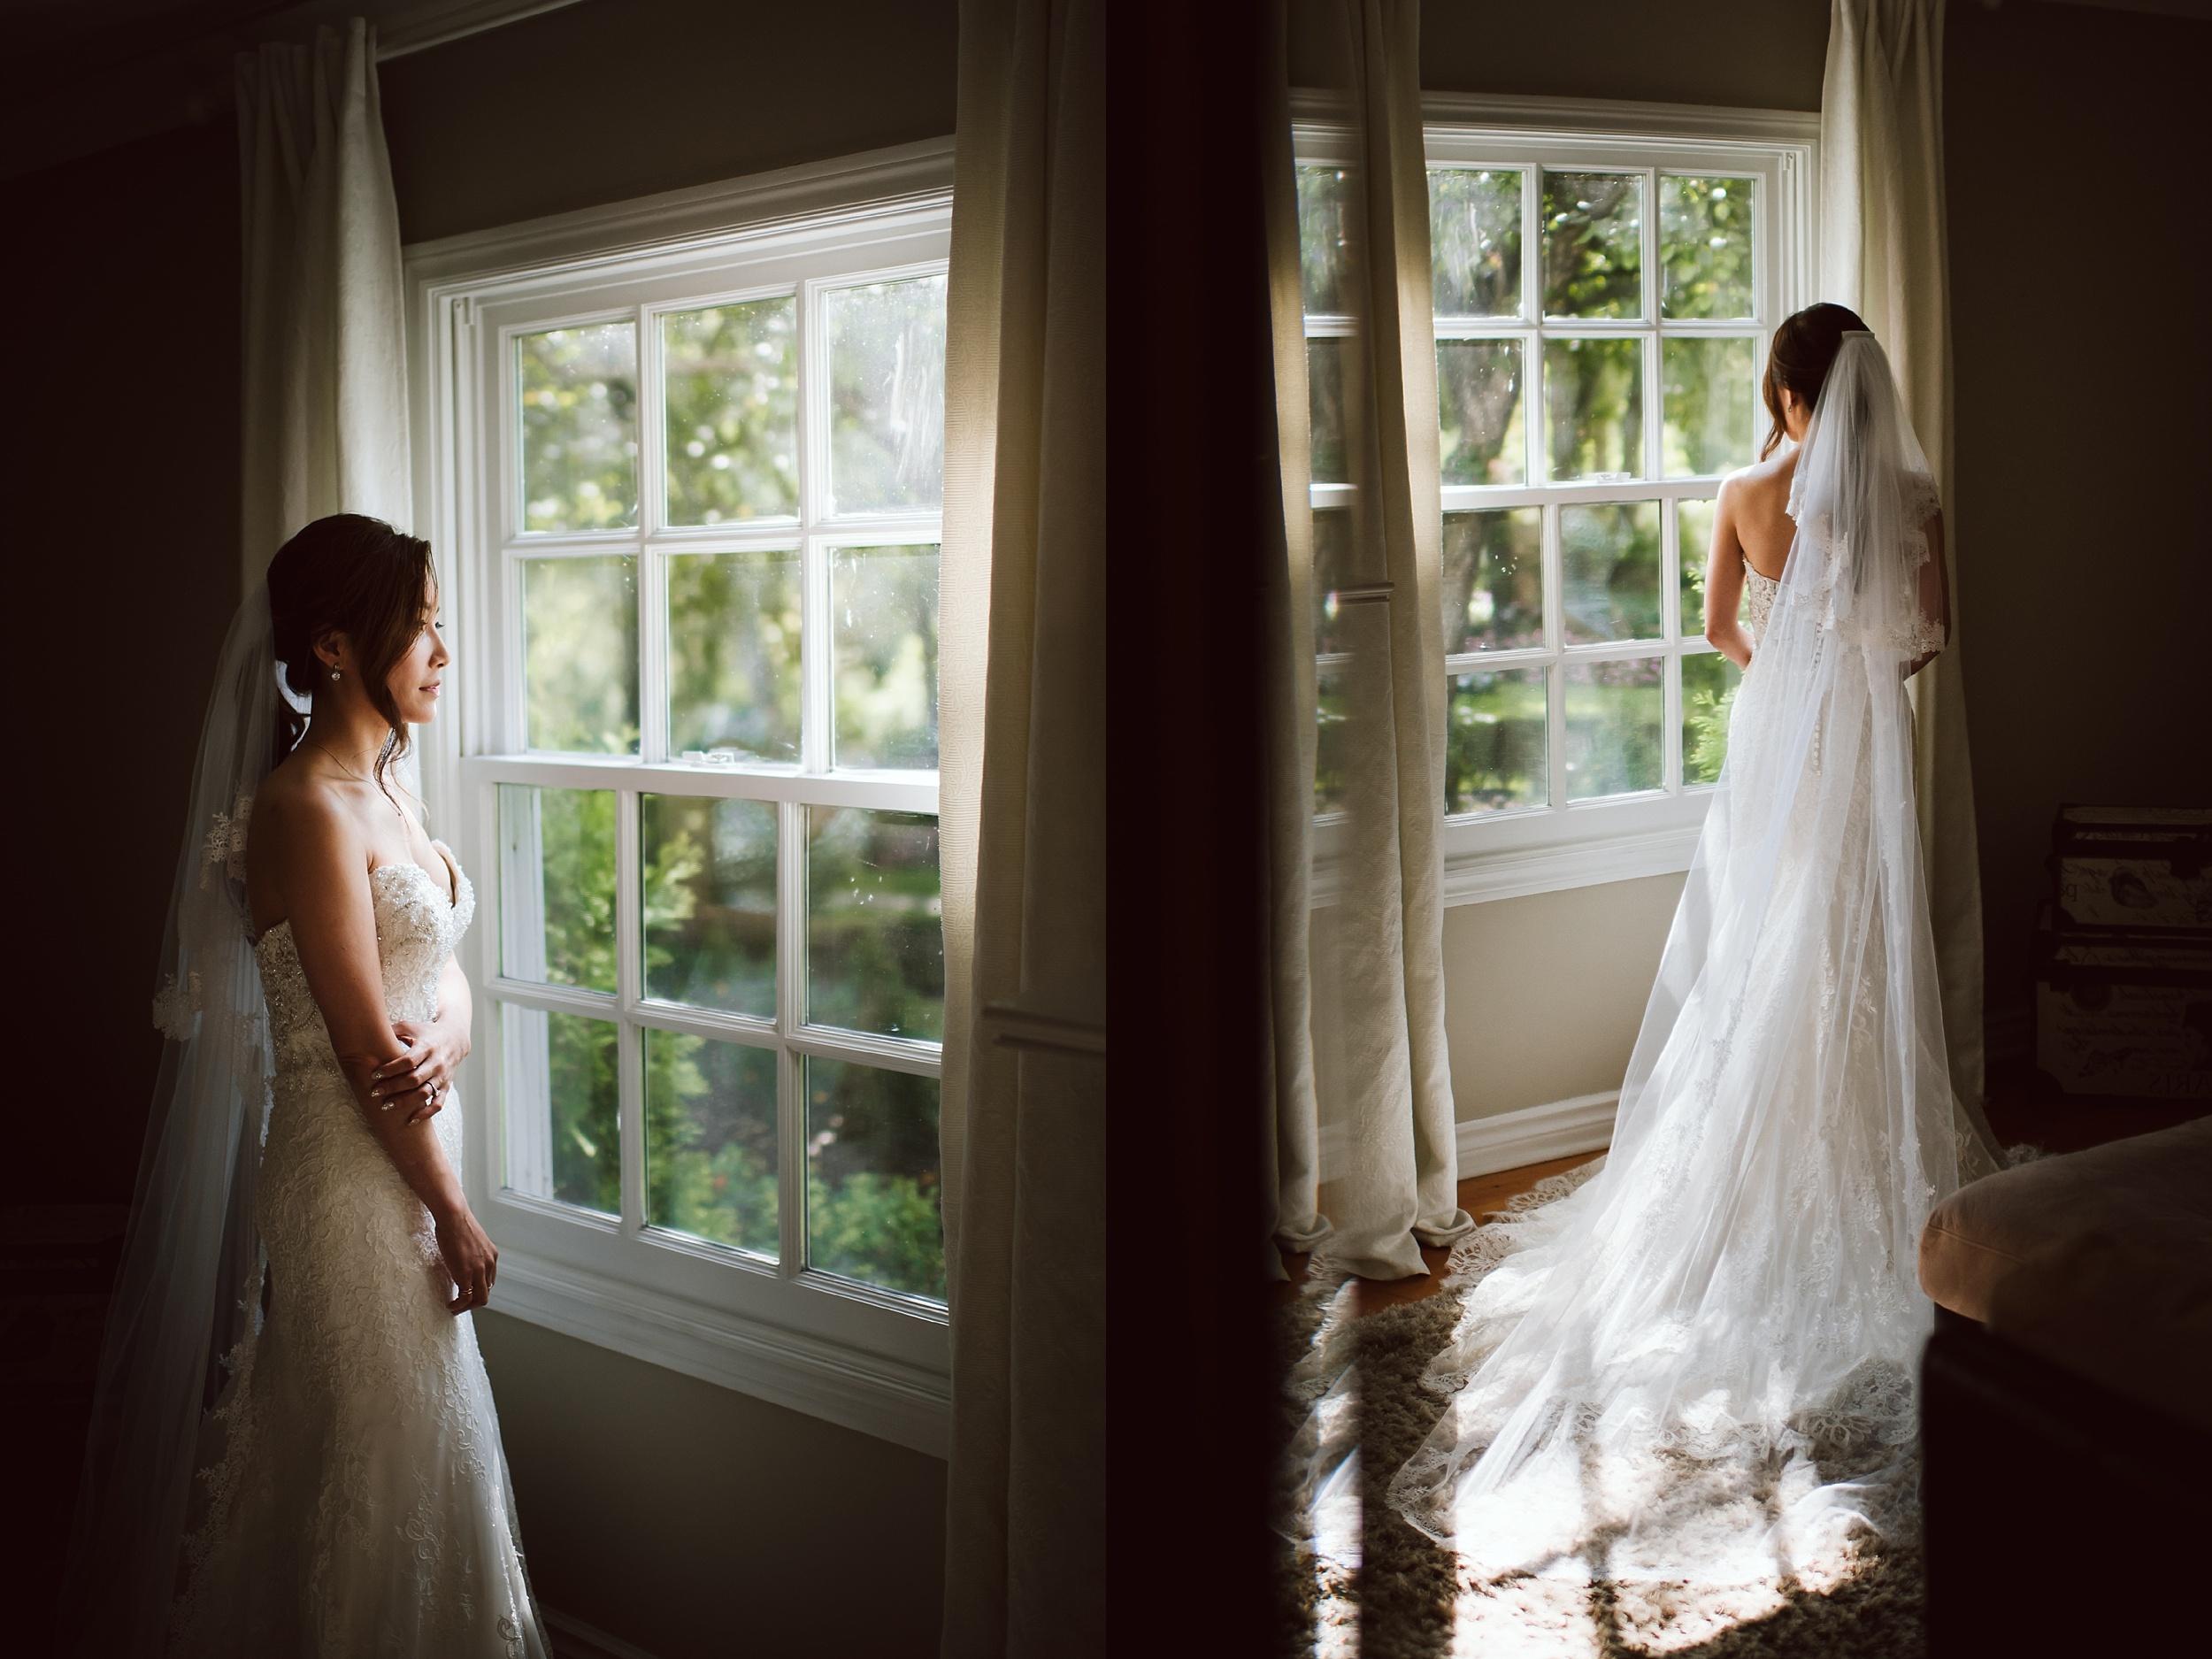 Doctors_House_Kleinburg_Wedding_Toronto_Photographer_0009.jpg